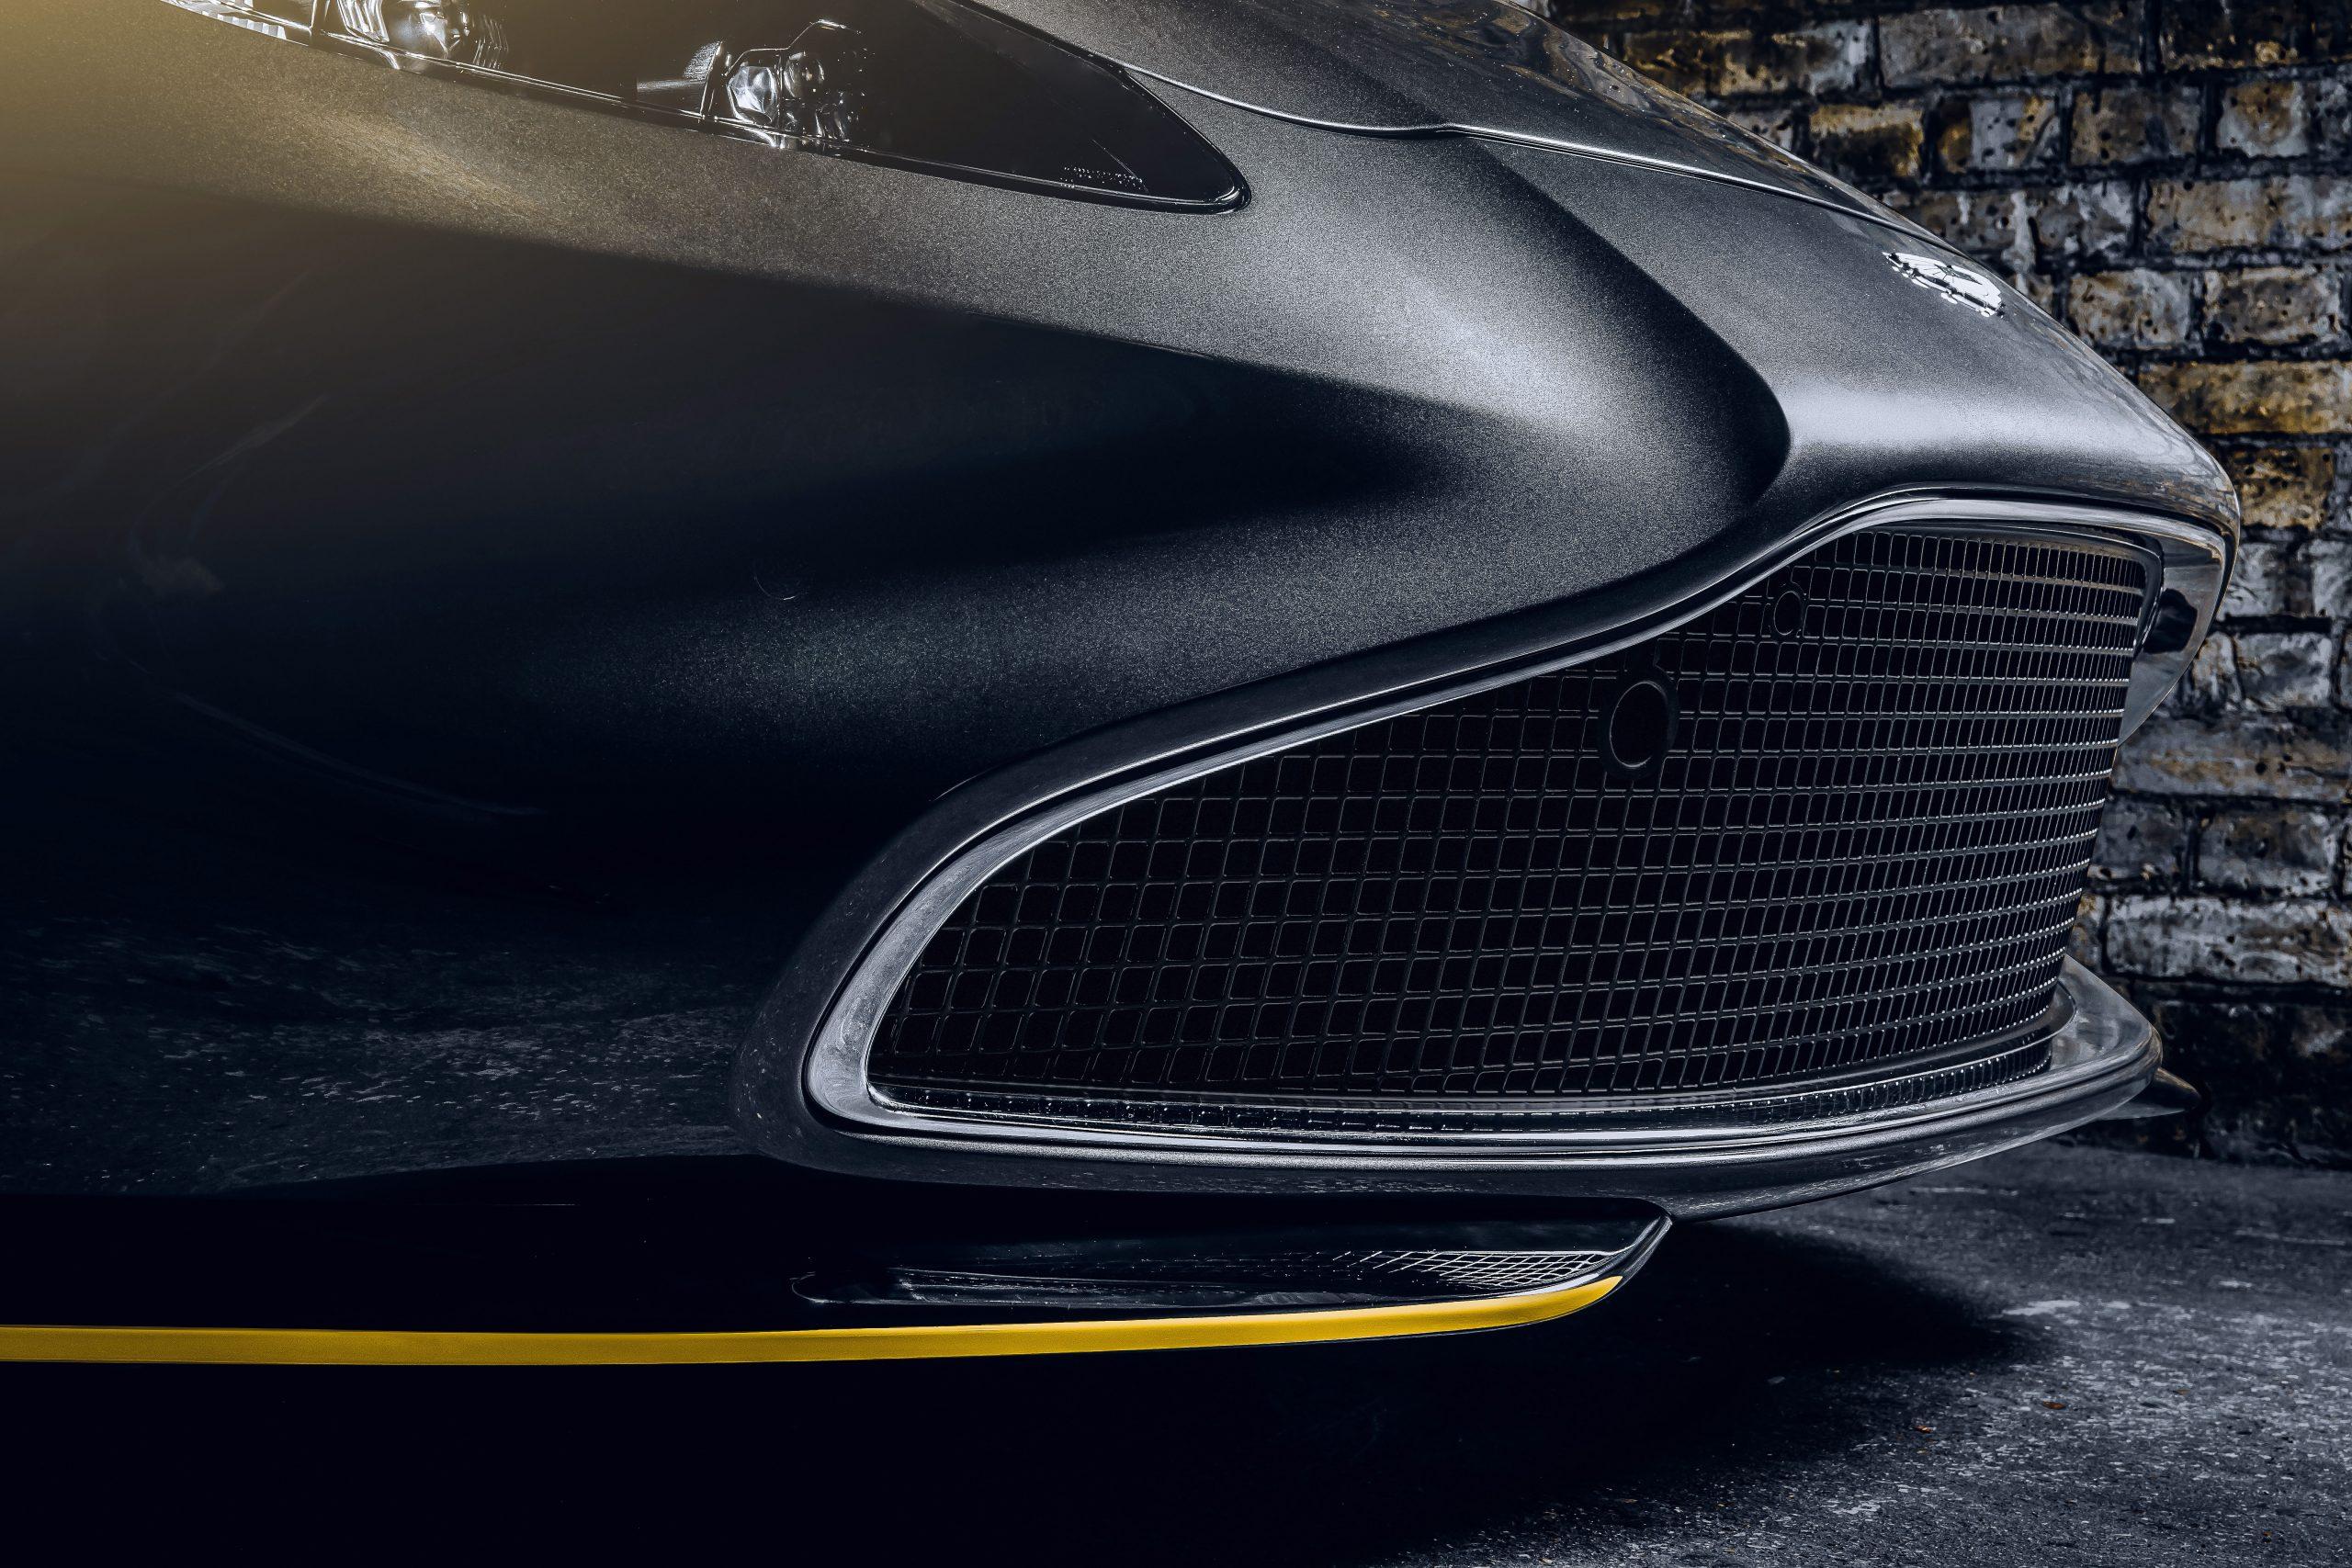 Aston Martin Vantage 007 Edition front grille